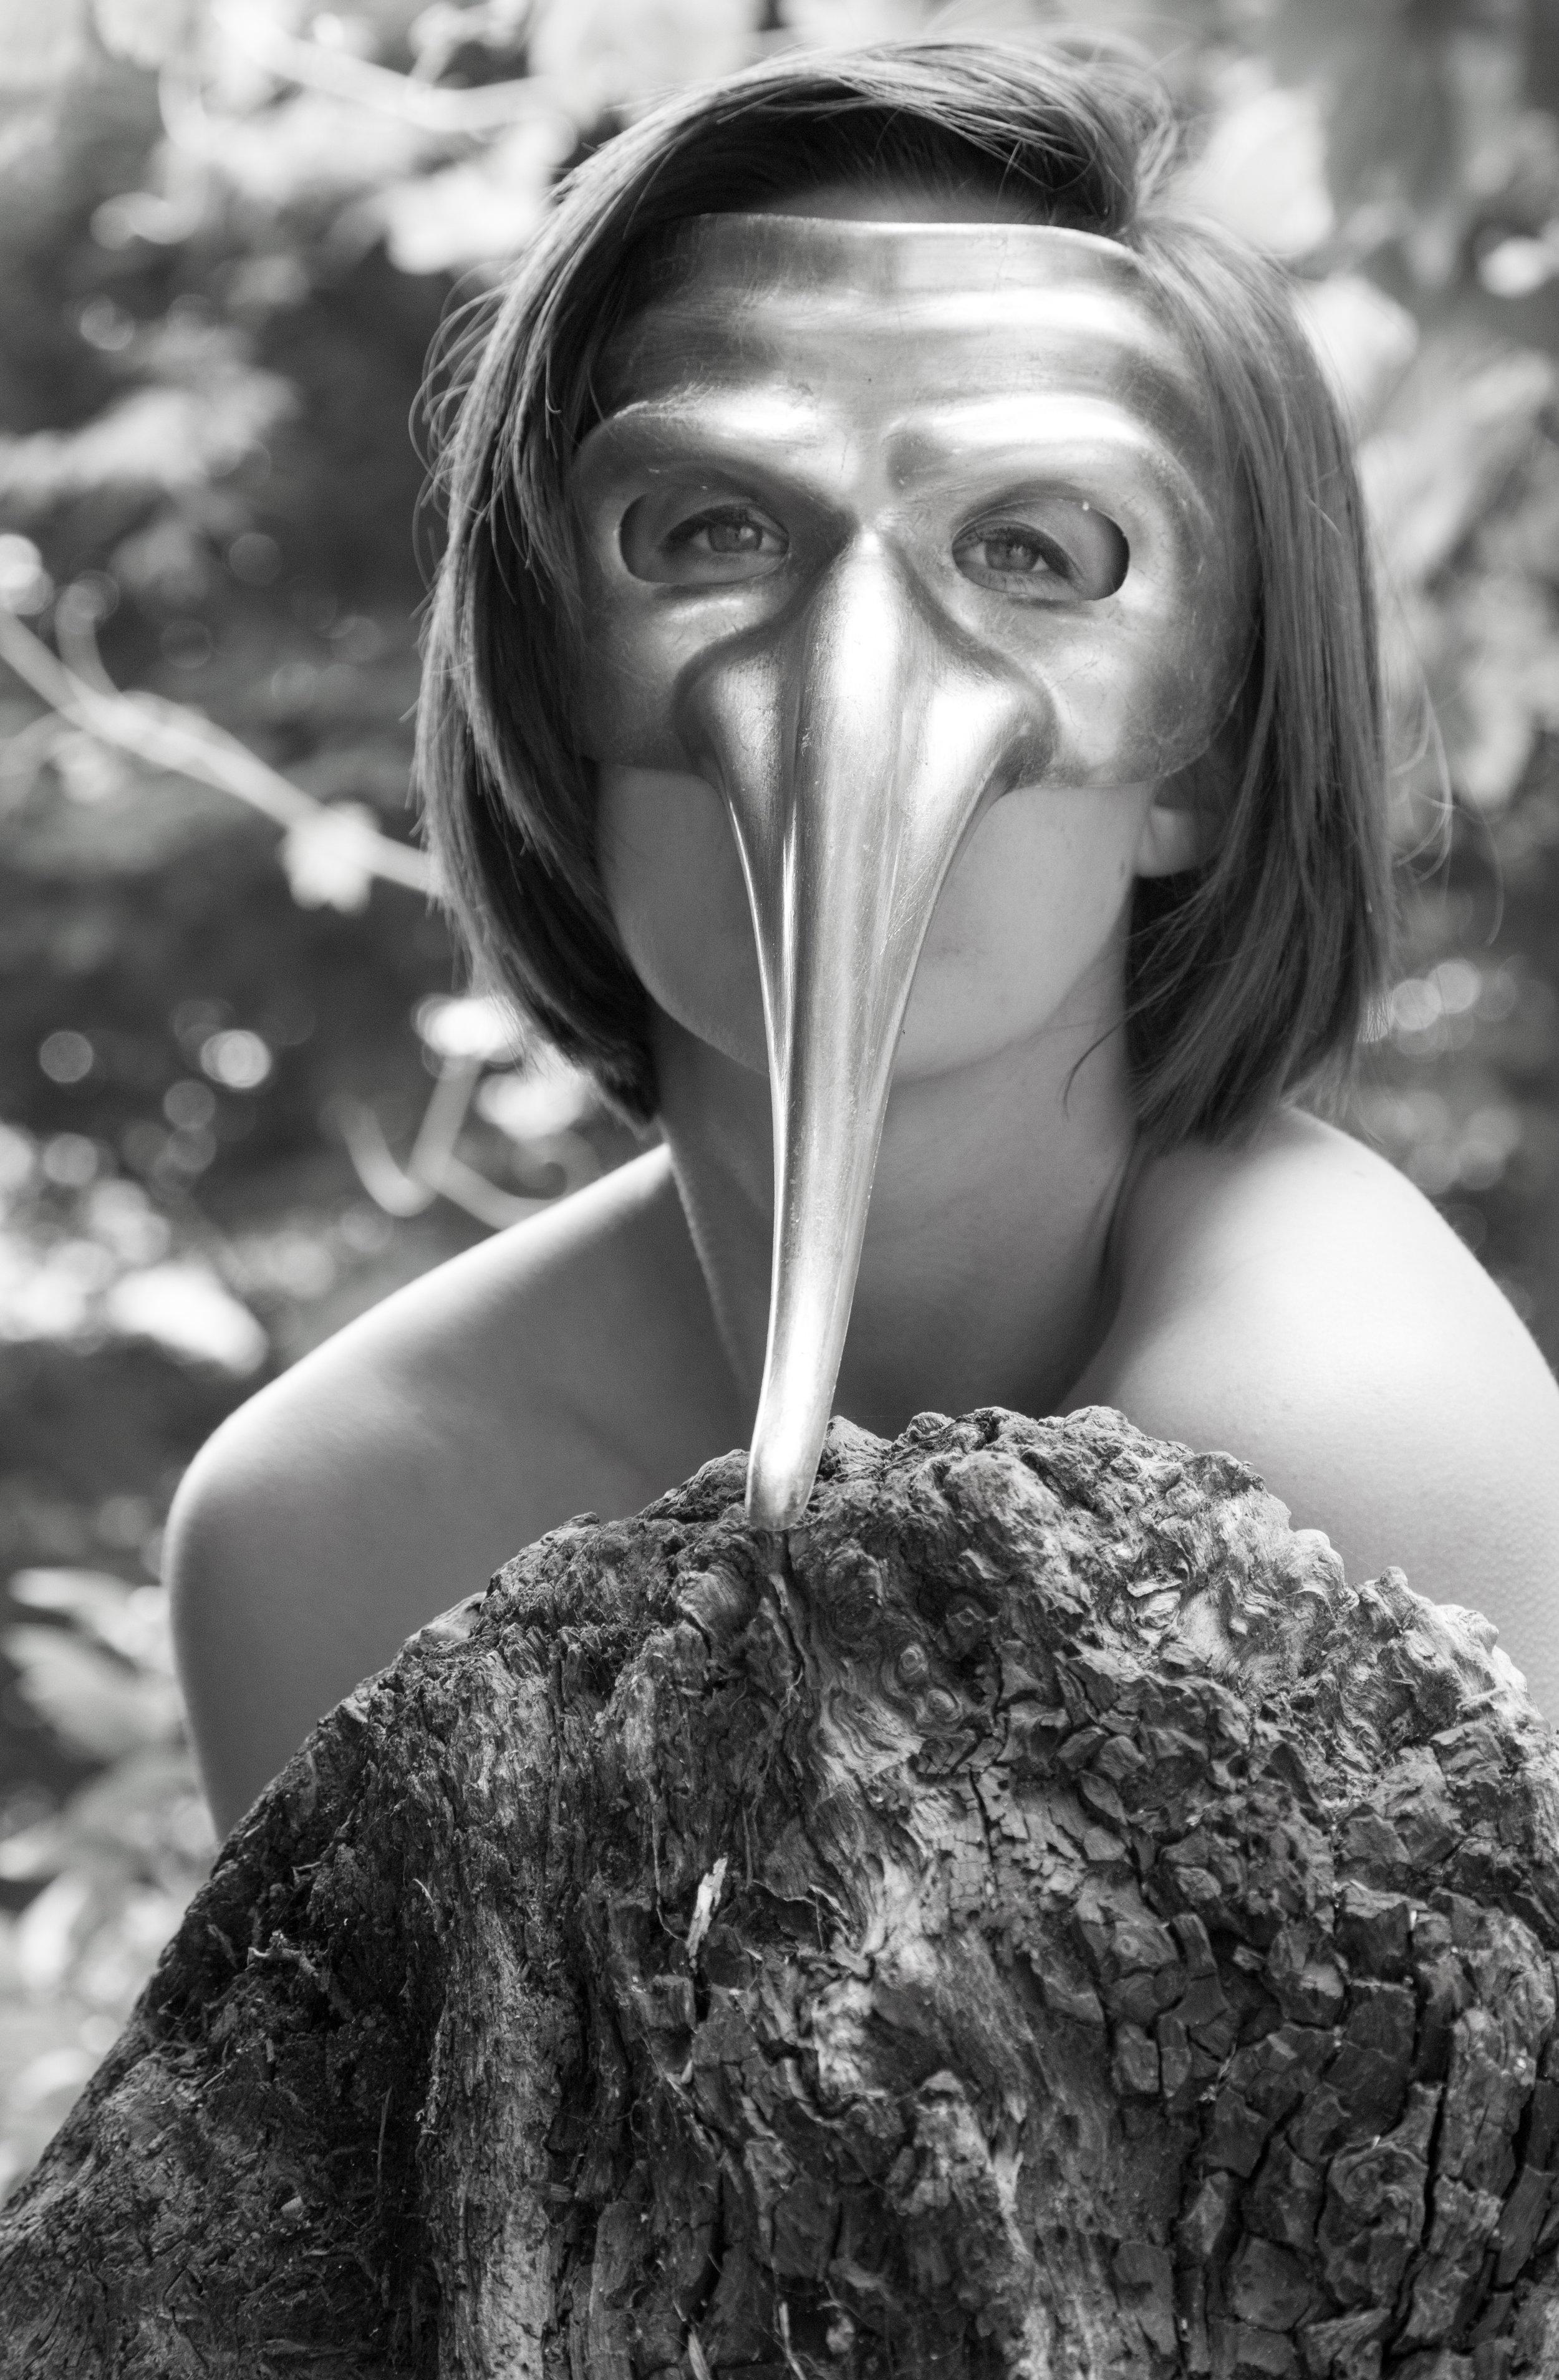 Nymph's mask 3